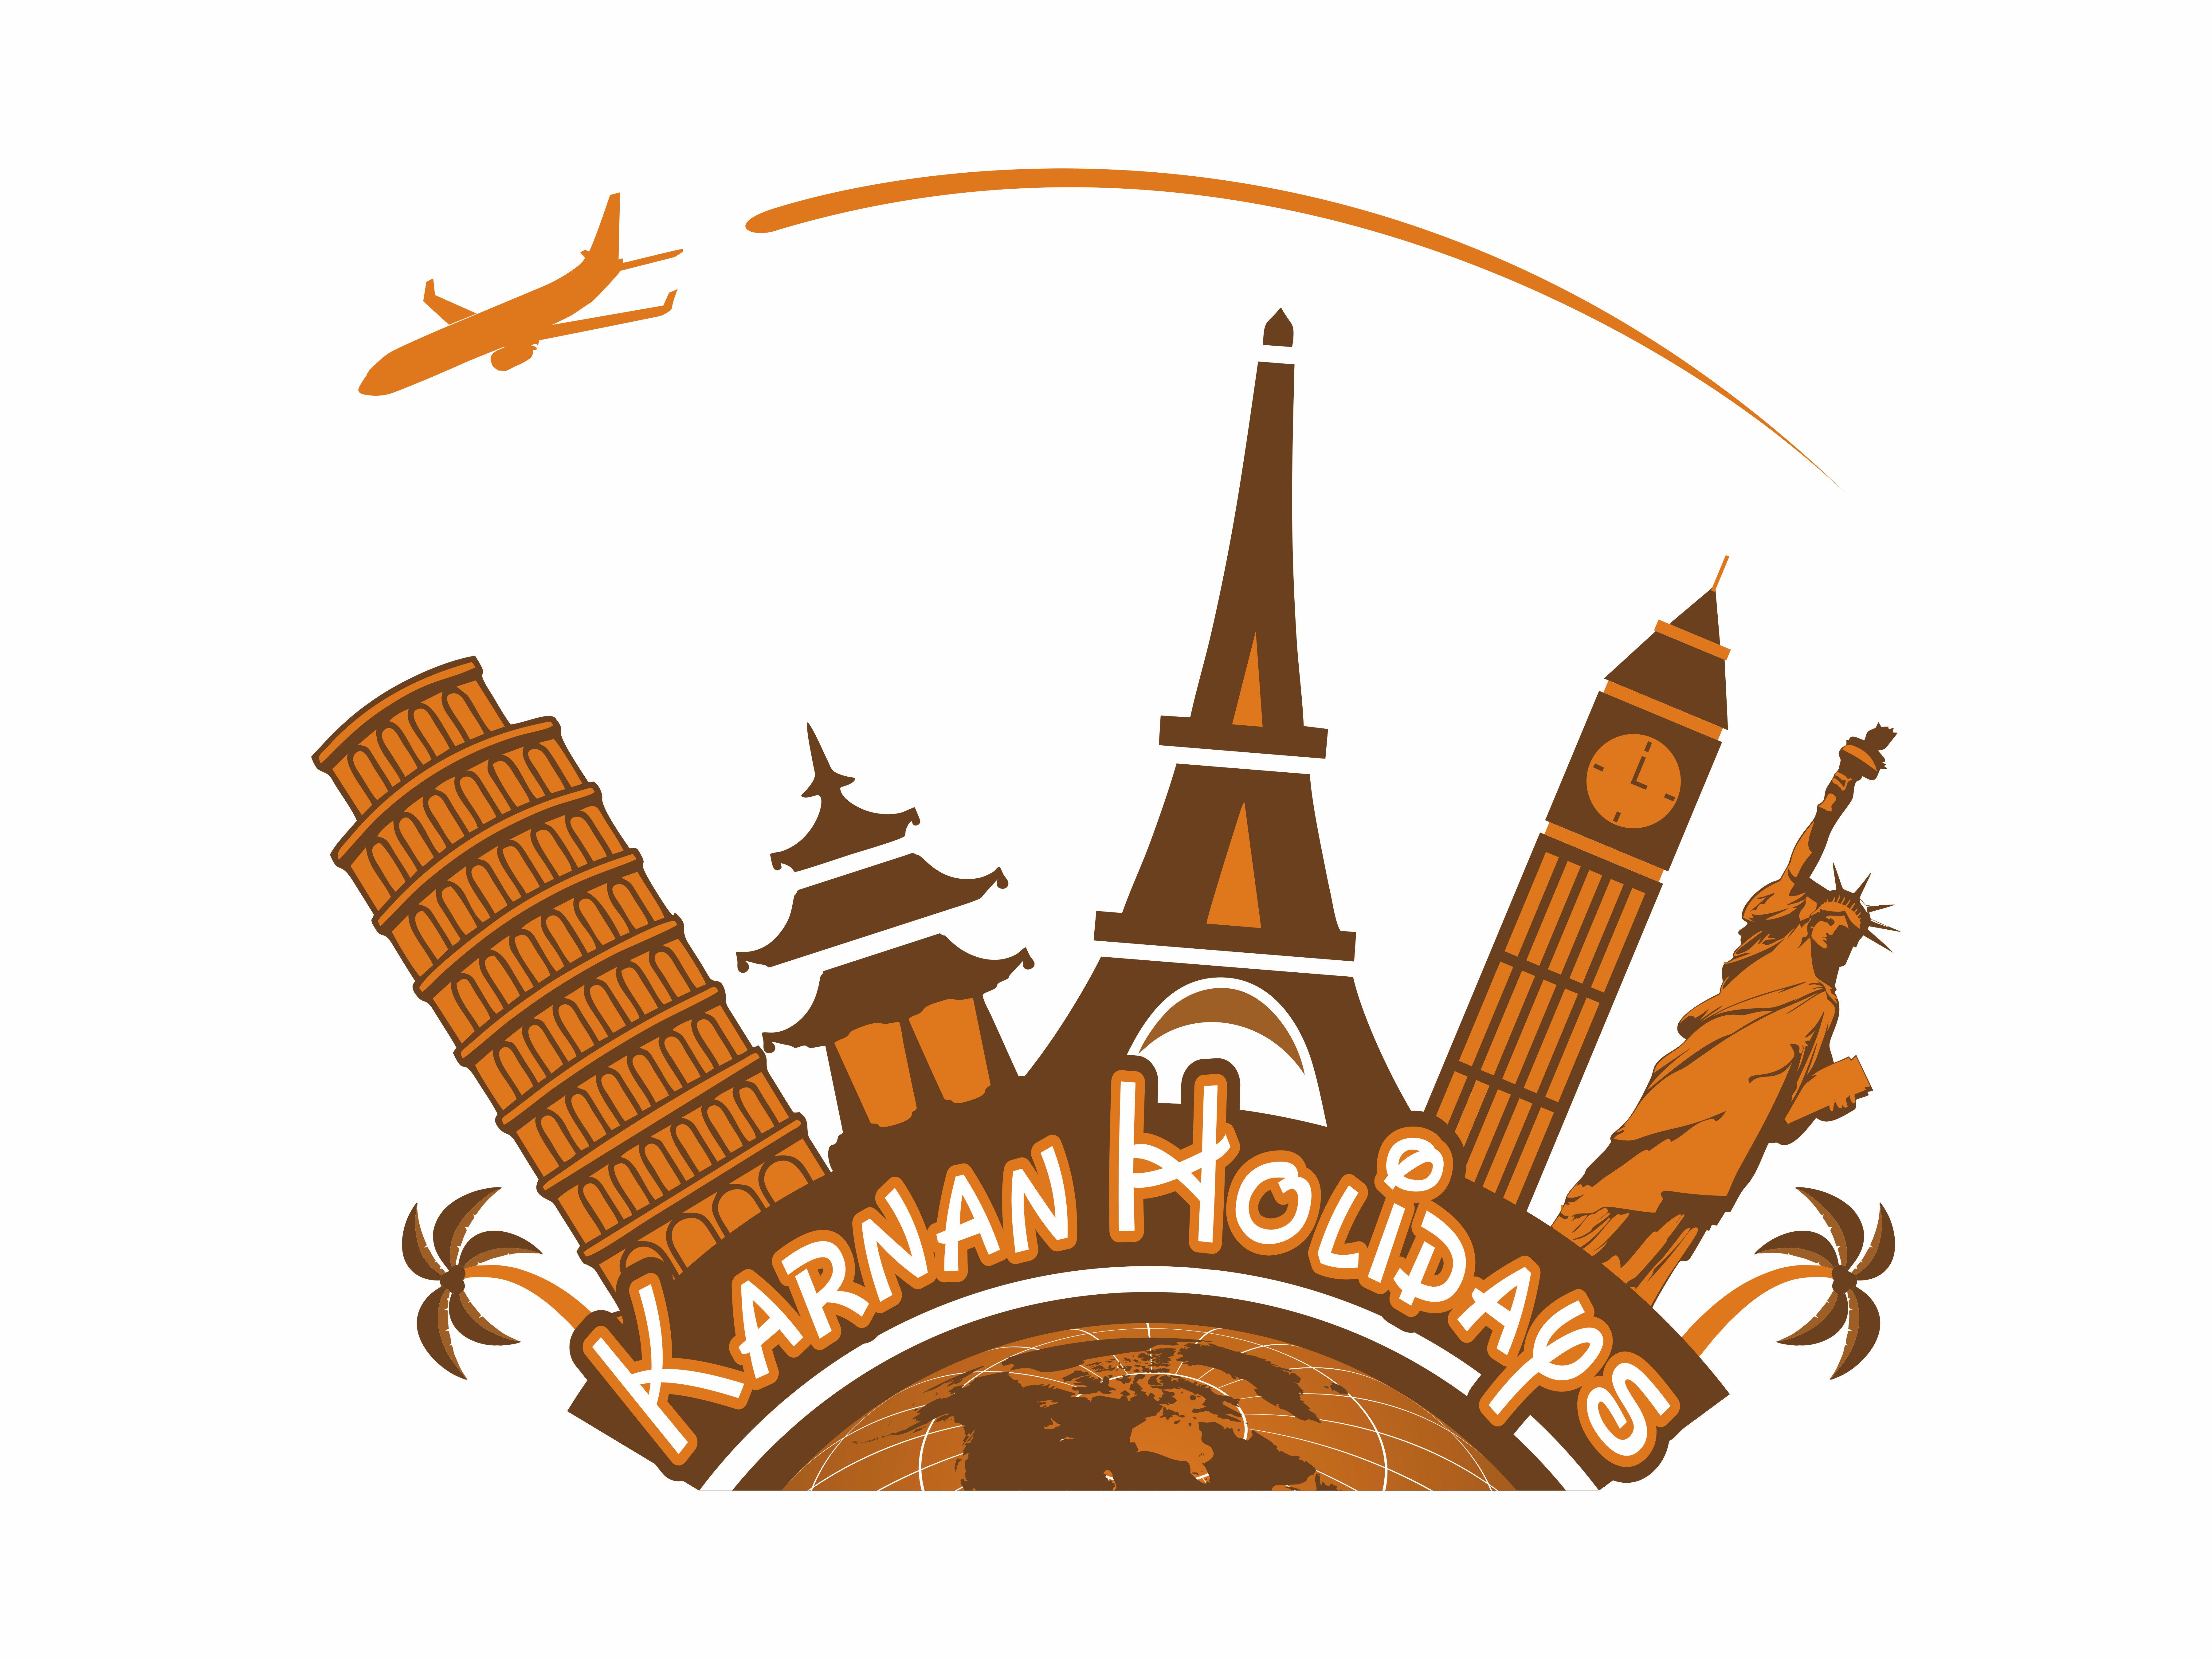 Karnan Holidays